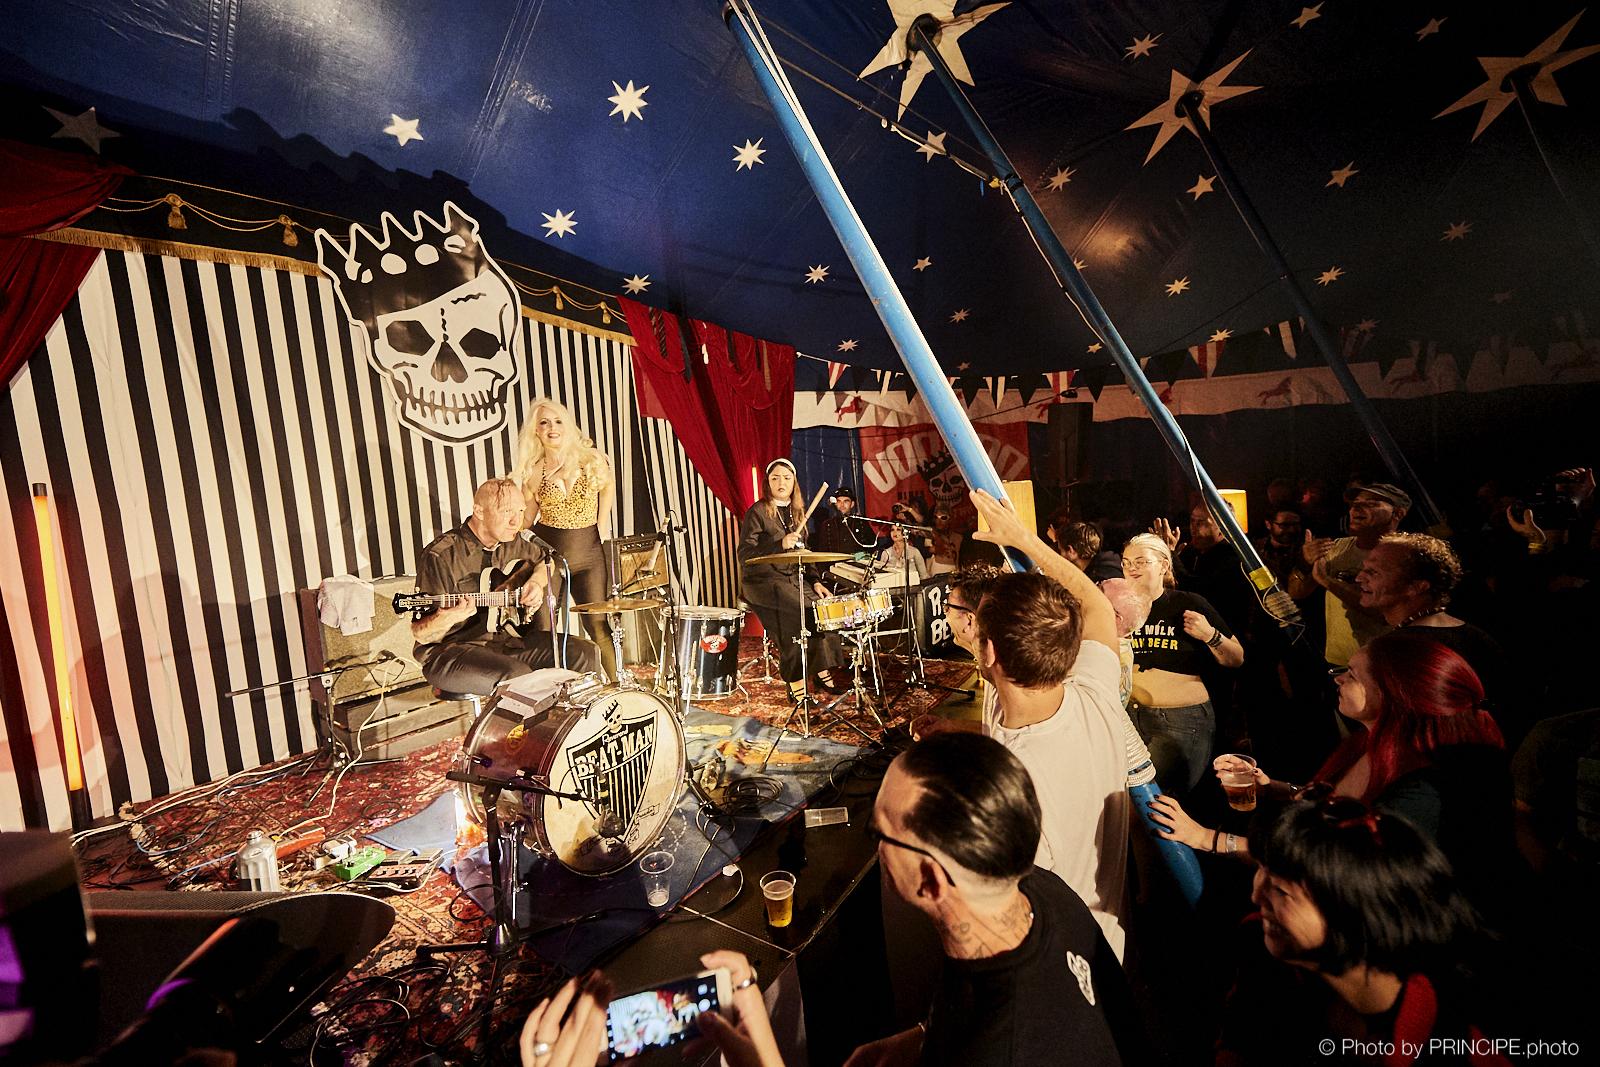 Reverend Beat Man and Sister Izobel Garcia @ Voodoo Rhythm Circus